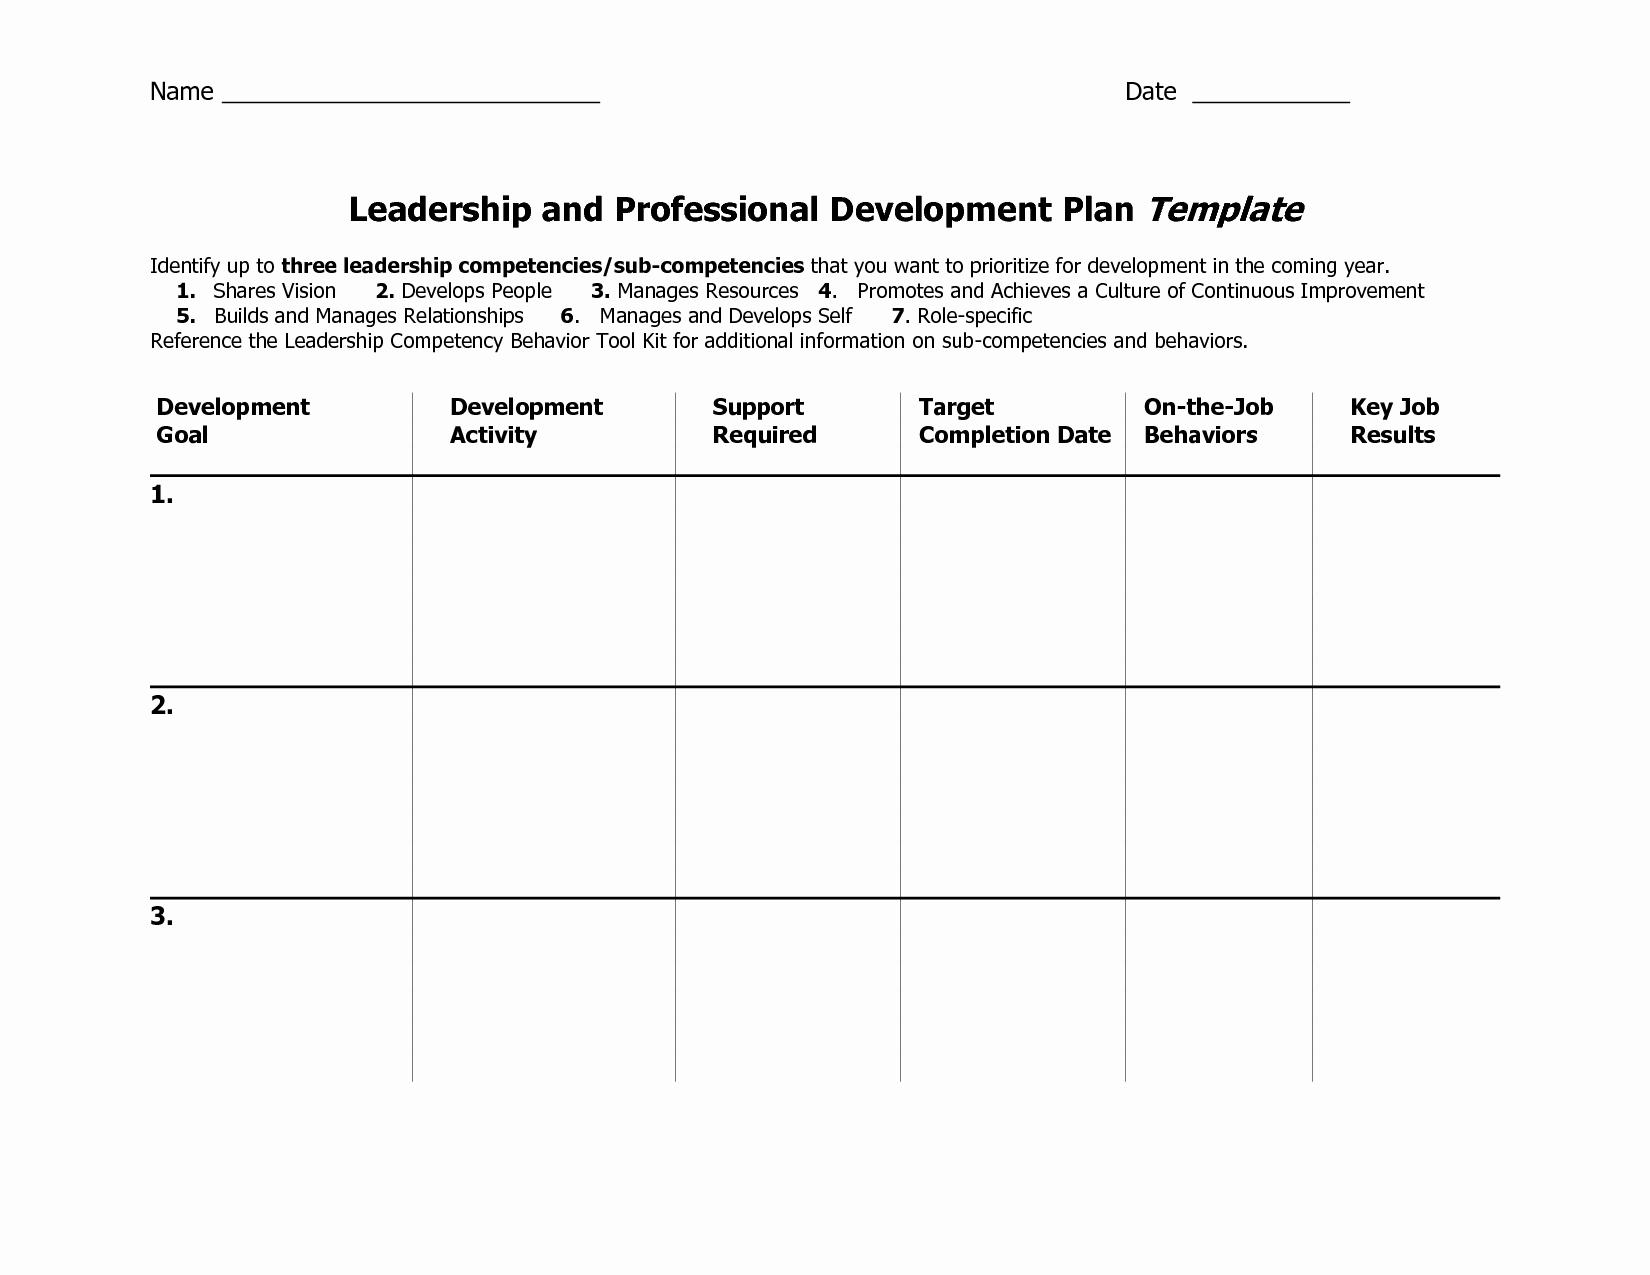 Leadership Development Plan Template Awesome Individual Development Plan Template Word Google Search